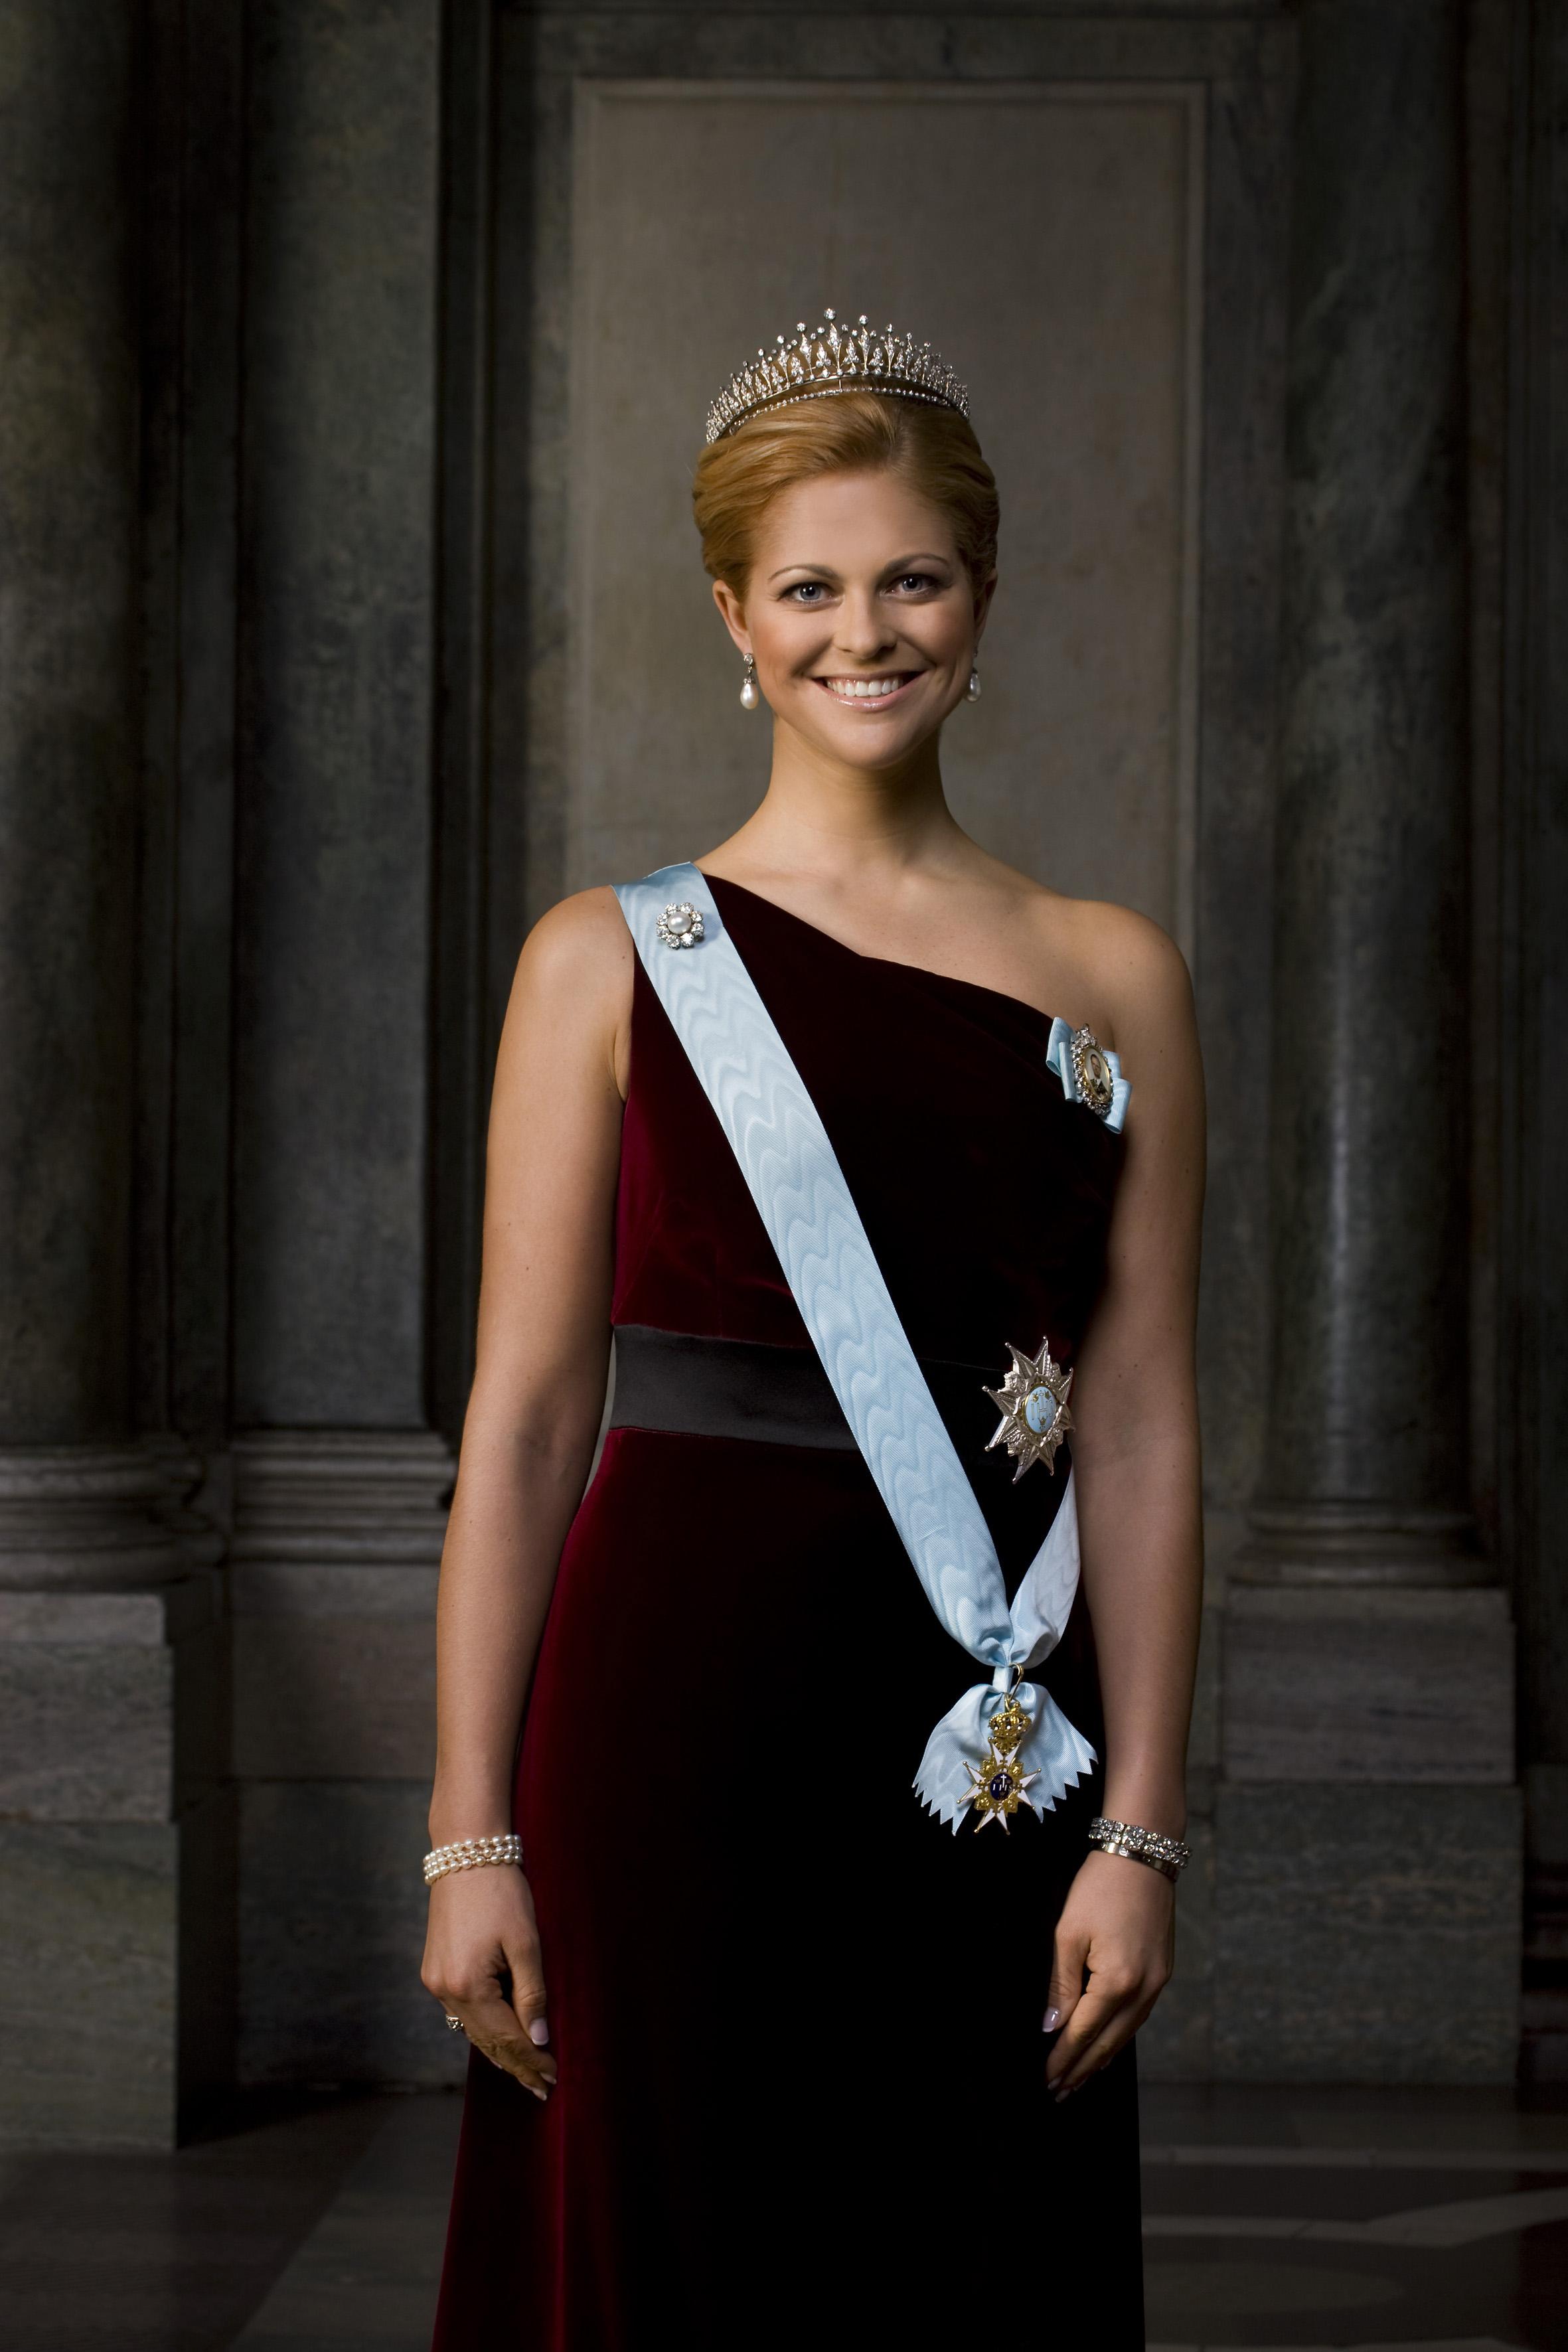 Princess Madeleine, Duchess of Hälsingland and Gästrikland ...